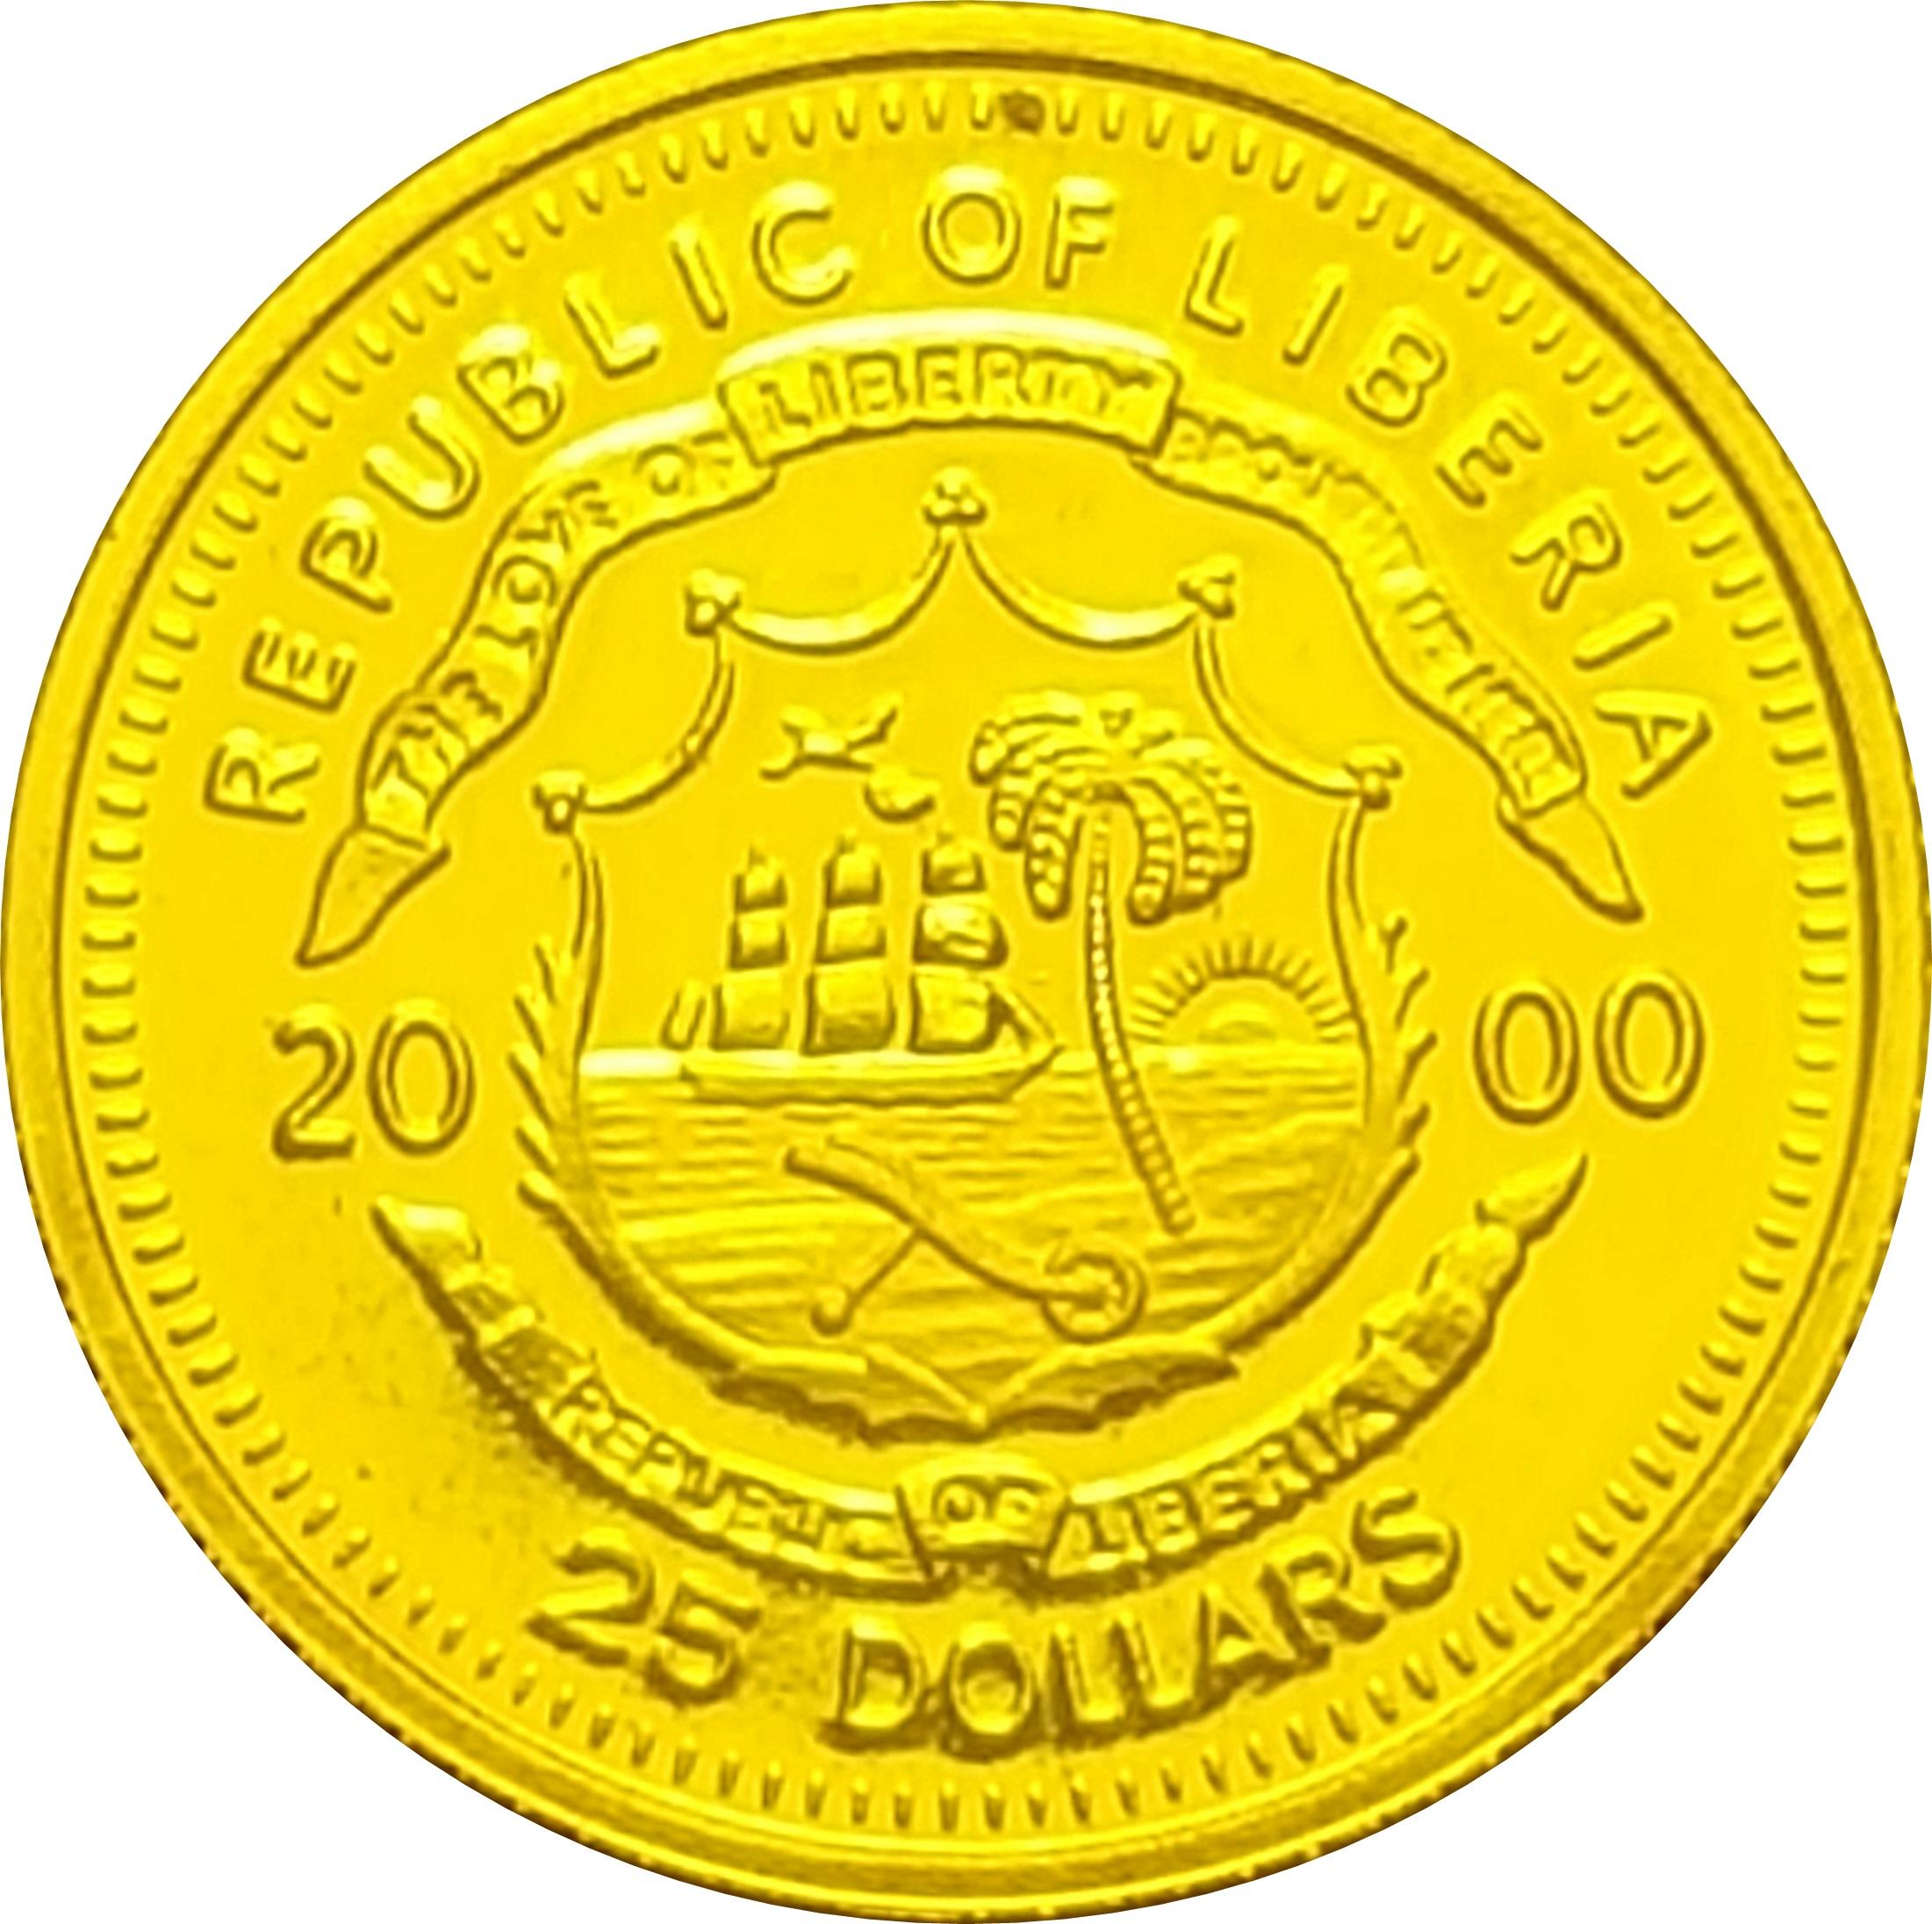 25 Dollars George Washington